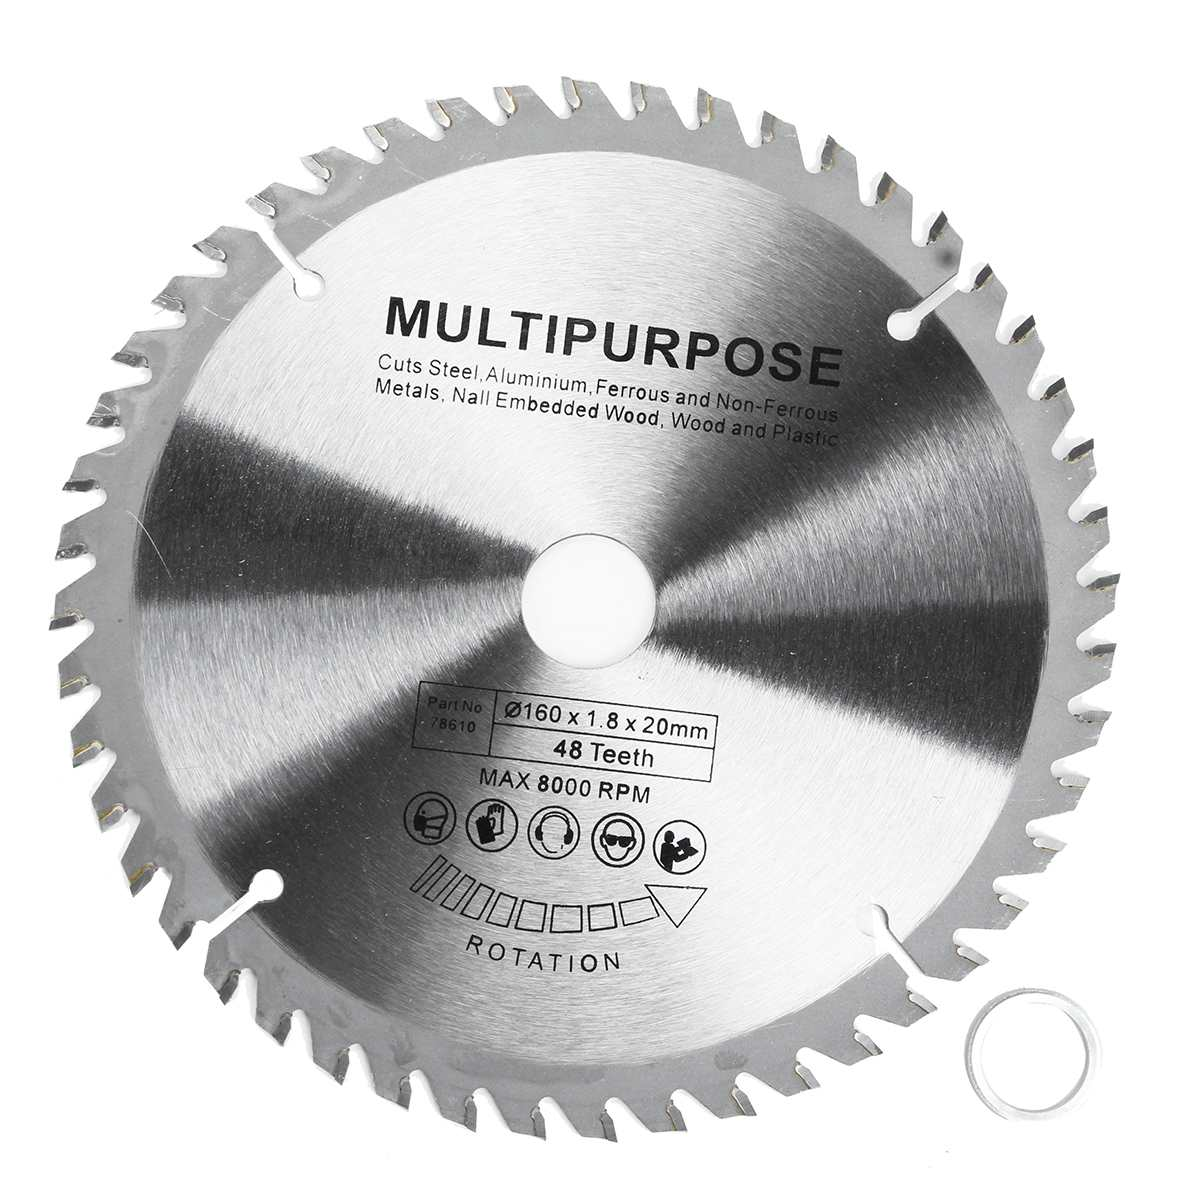 48 Teeth 8000RPM Steel Wood Plunge Saw Blade 160mm X 20mm X 1.8mm Multi-function Blade